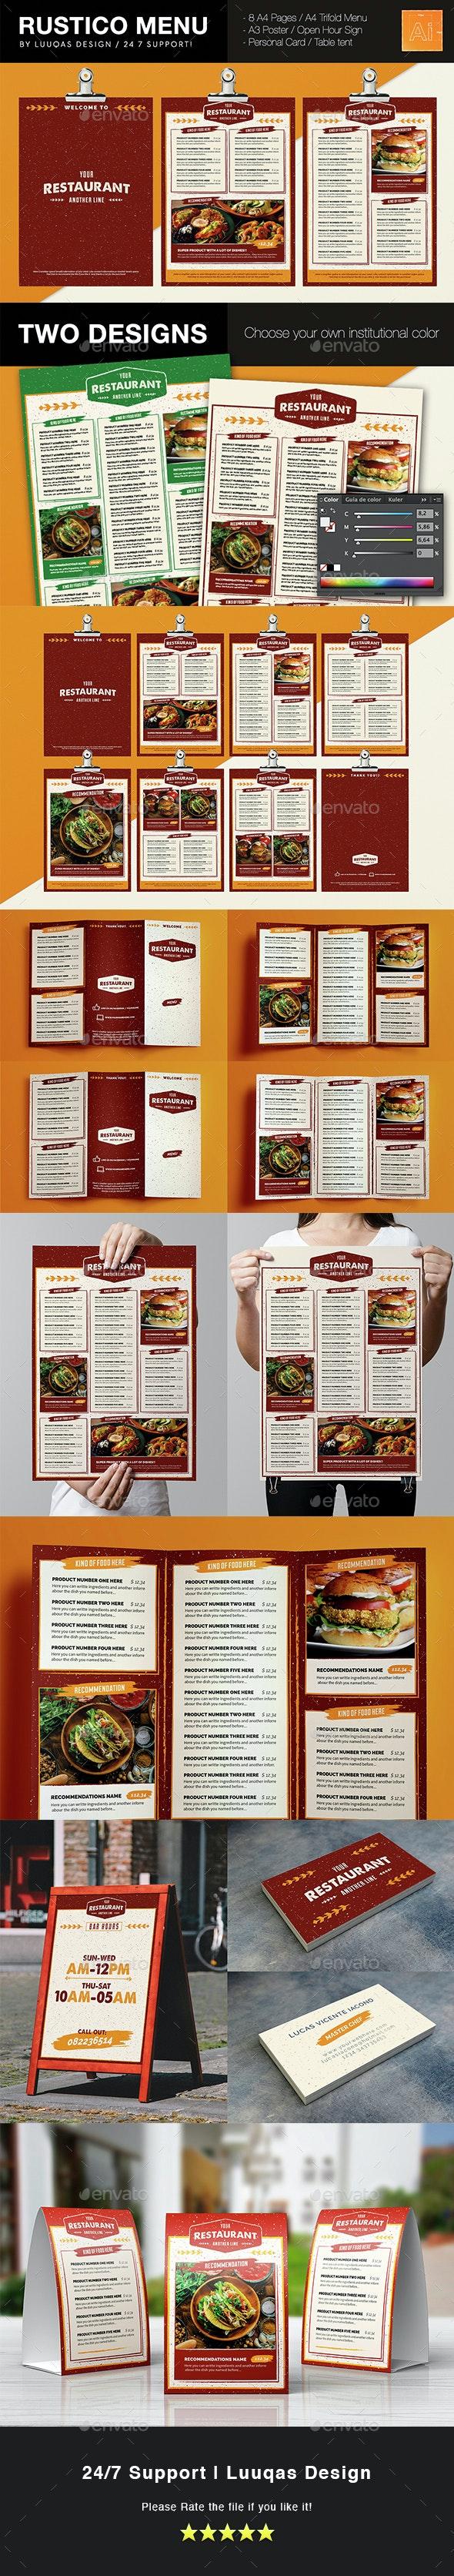 Rustico Menu Illustrator Template - Food Menus Print Templates